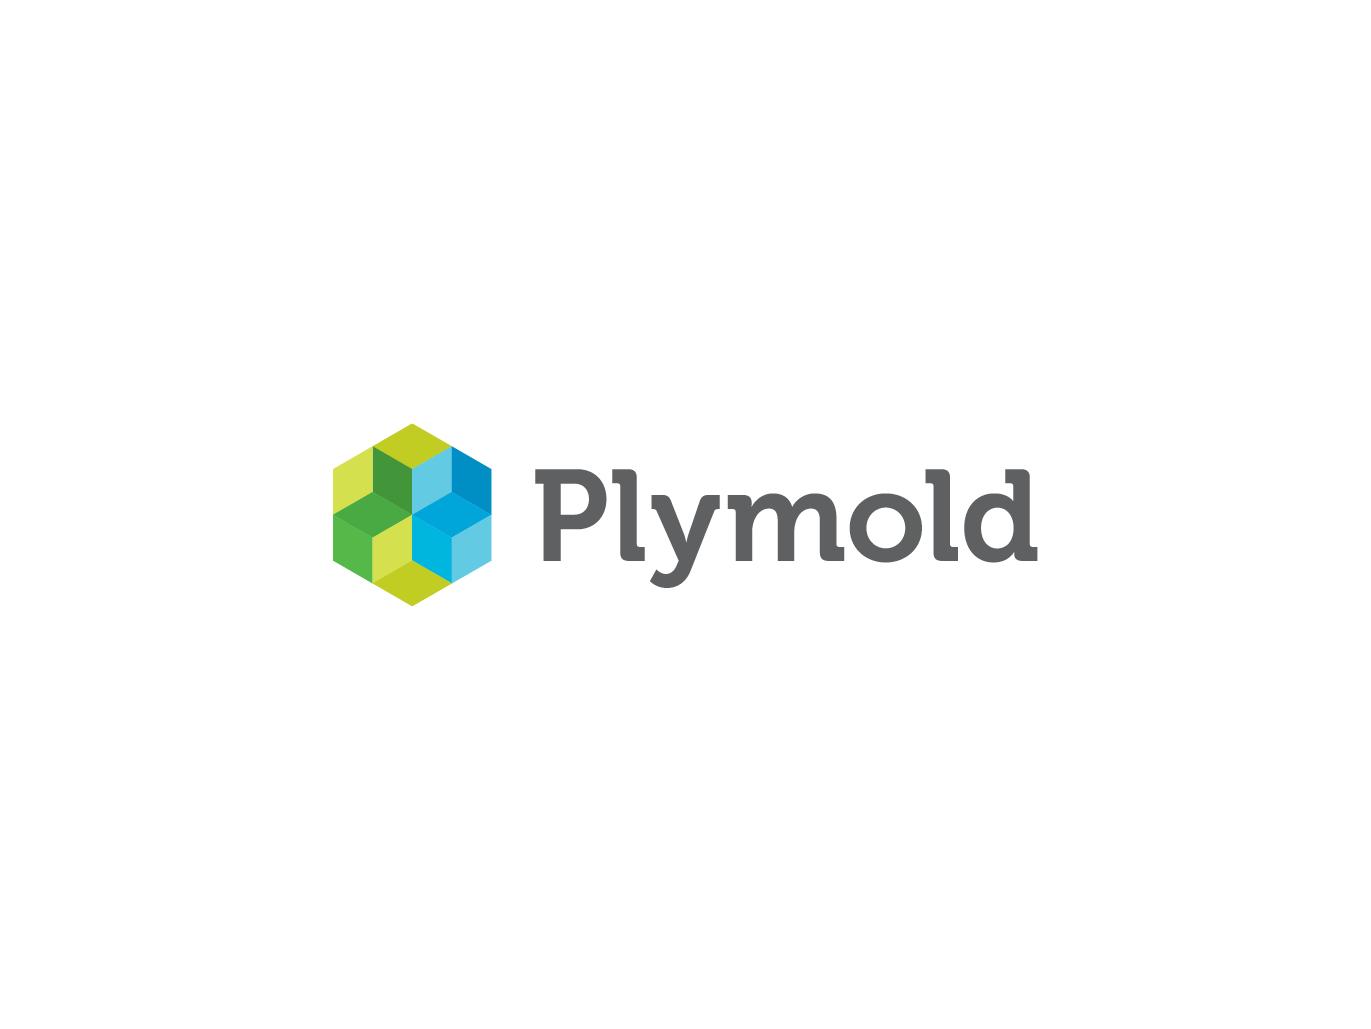 PlymoldLogo